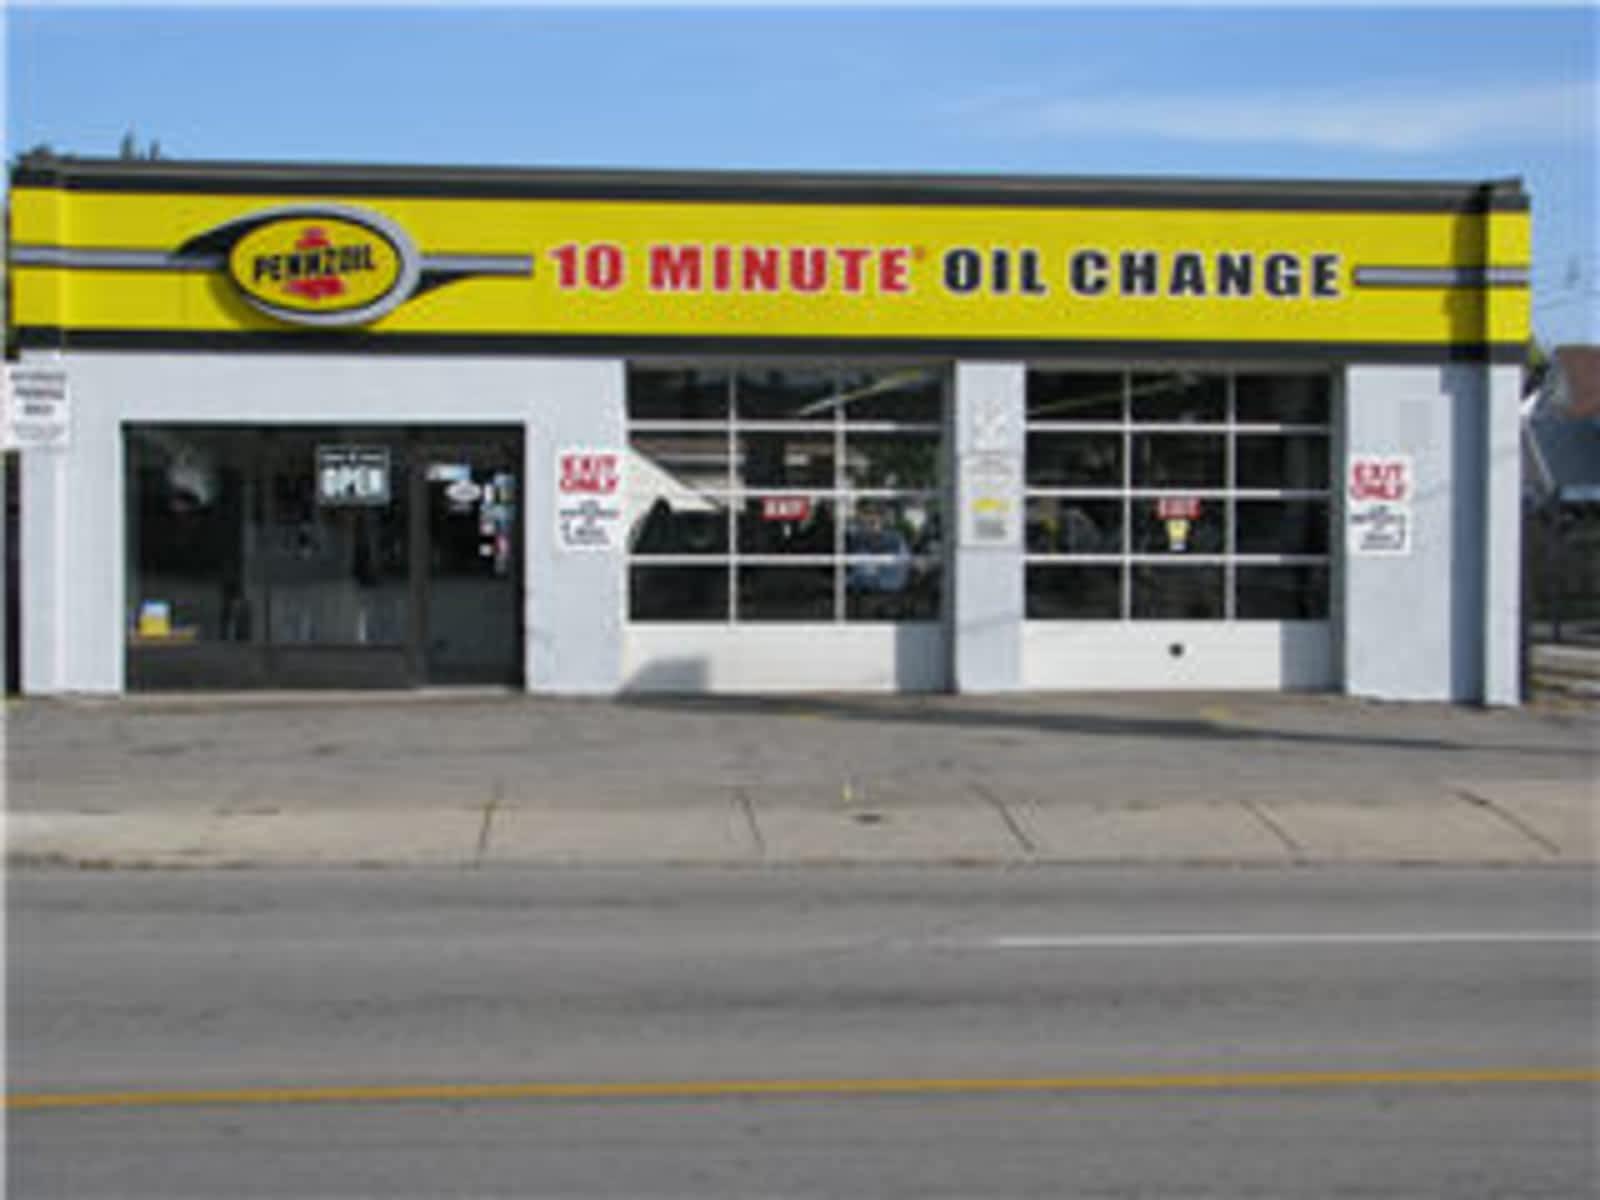 Pennzoil Near Me >> Pennzoil 10 Minute Oil Change Opening Hours 1485 Main St